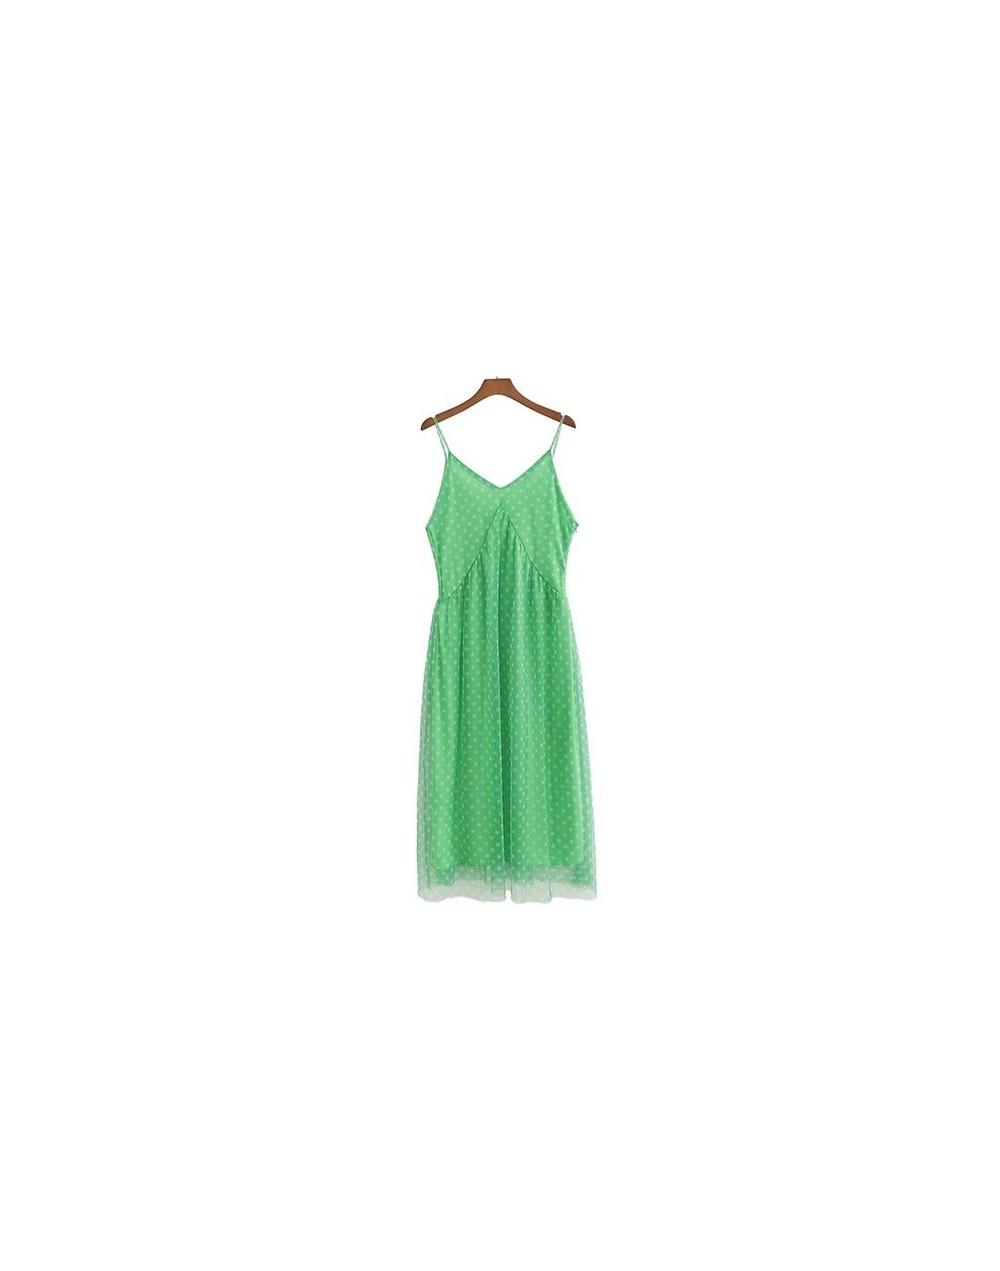 women polka dots V neck backless dress sleeveless side zipper fly design mesh female sweet casual mid calf dresses QC058 - g...